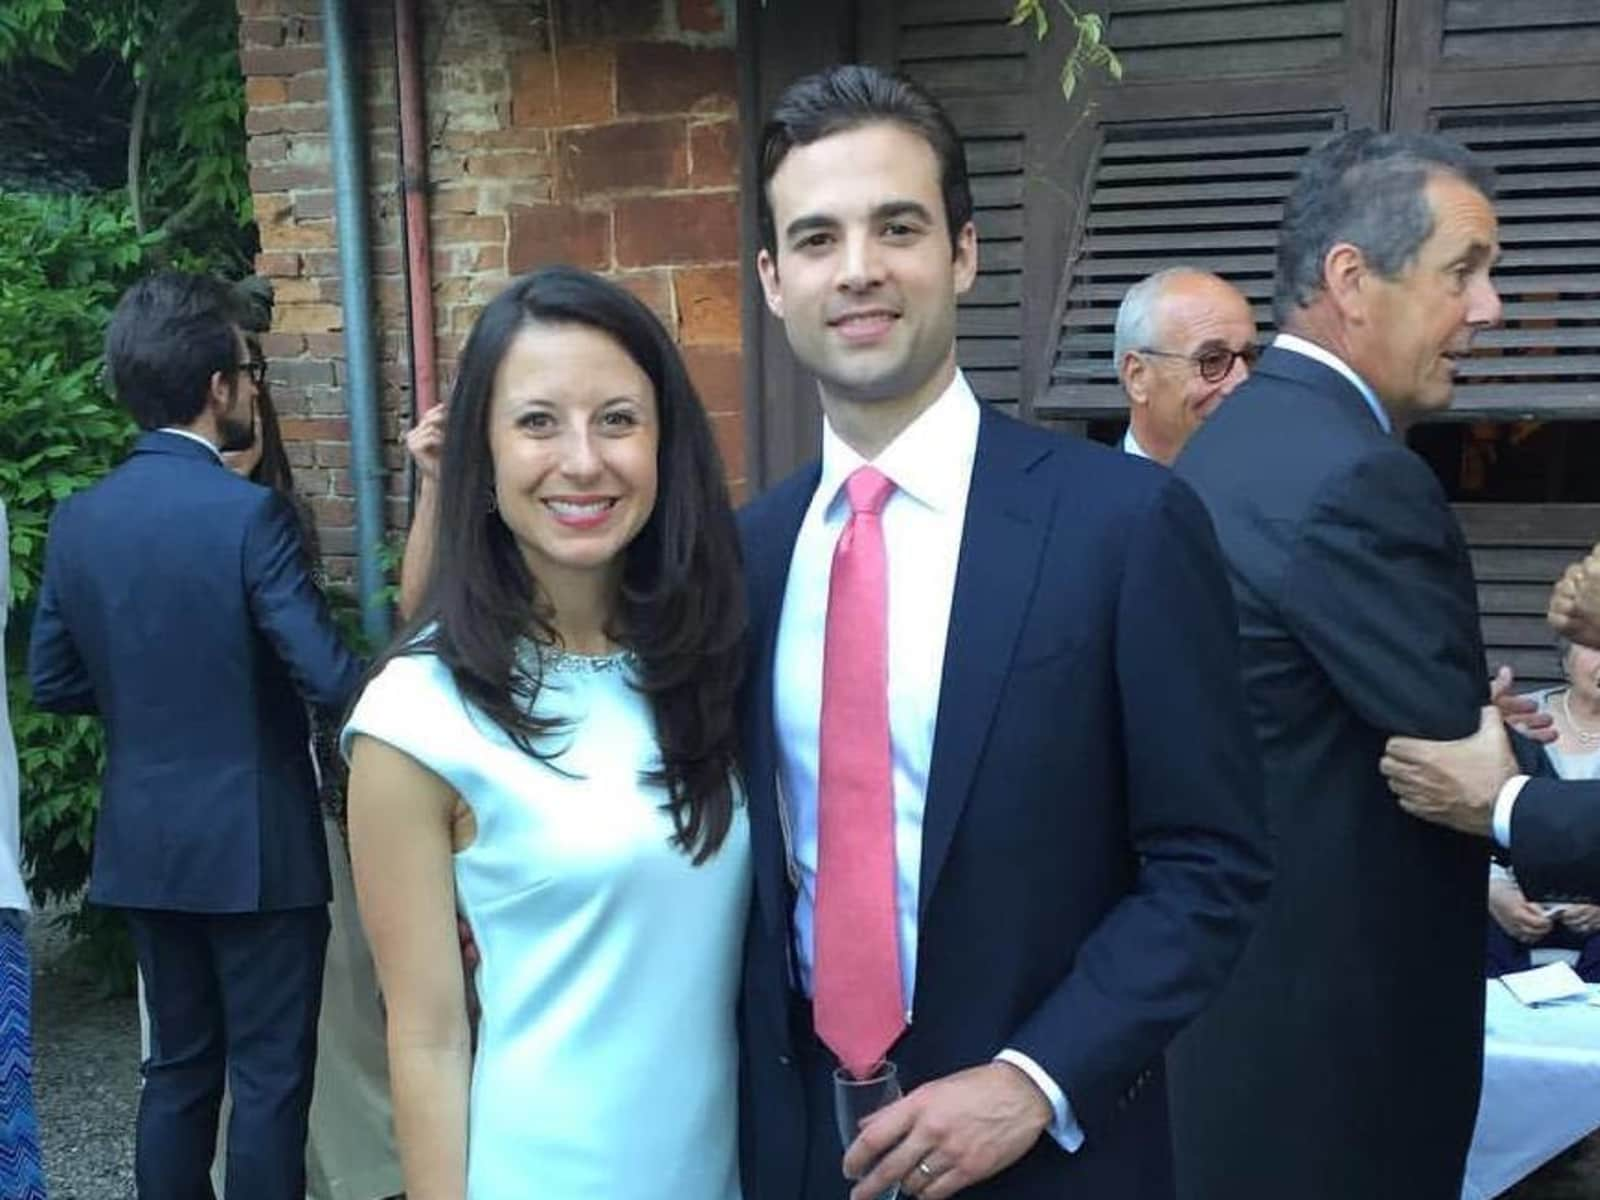 Ashley & Corey from London, United Kingdom